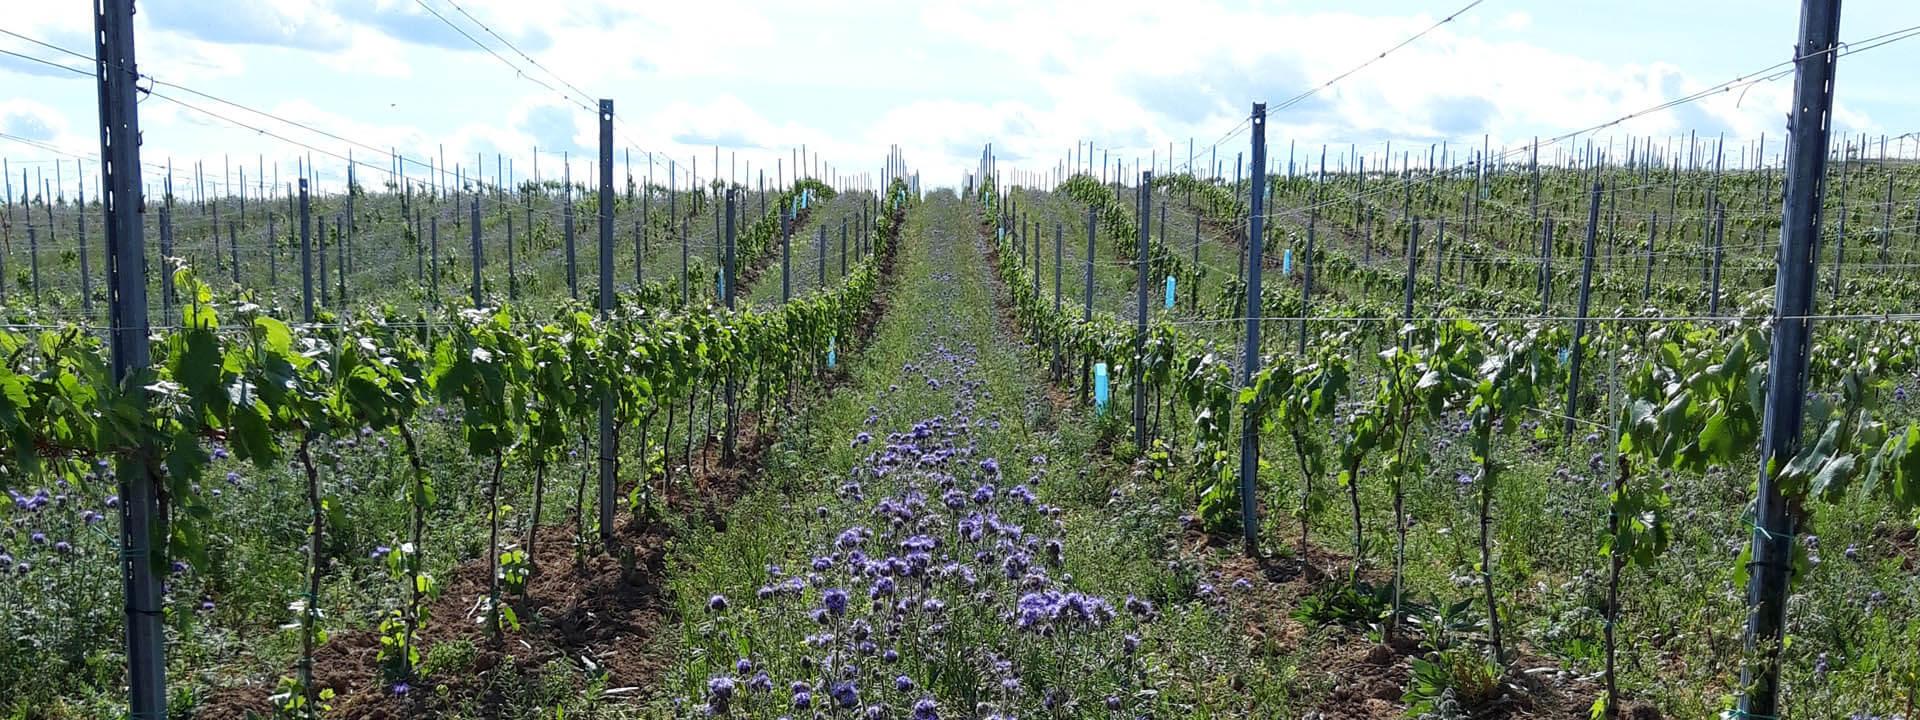 Steigler pince Sopron ültetvény